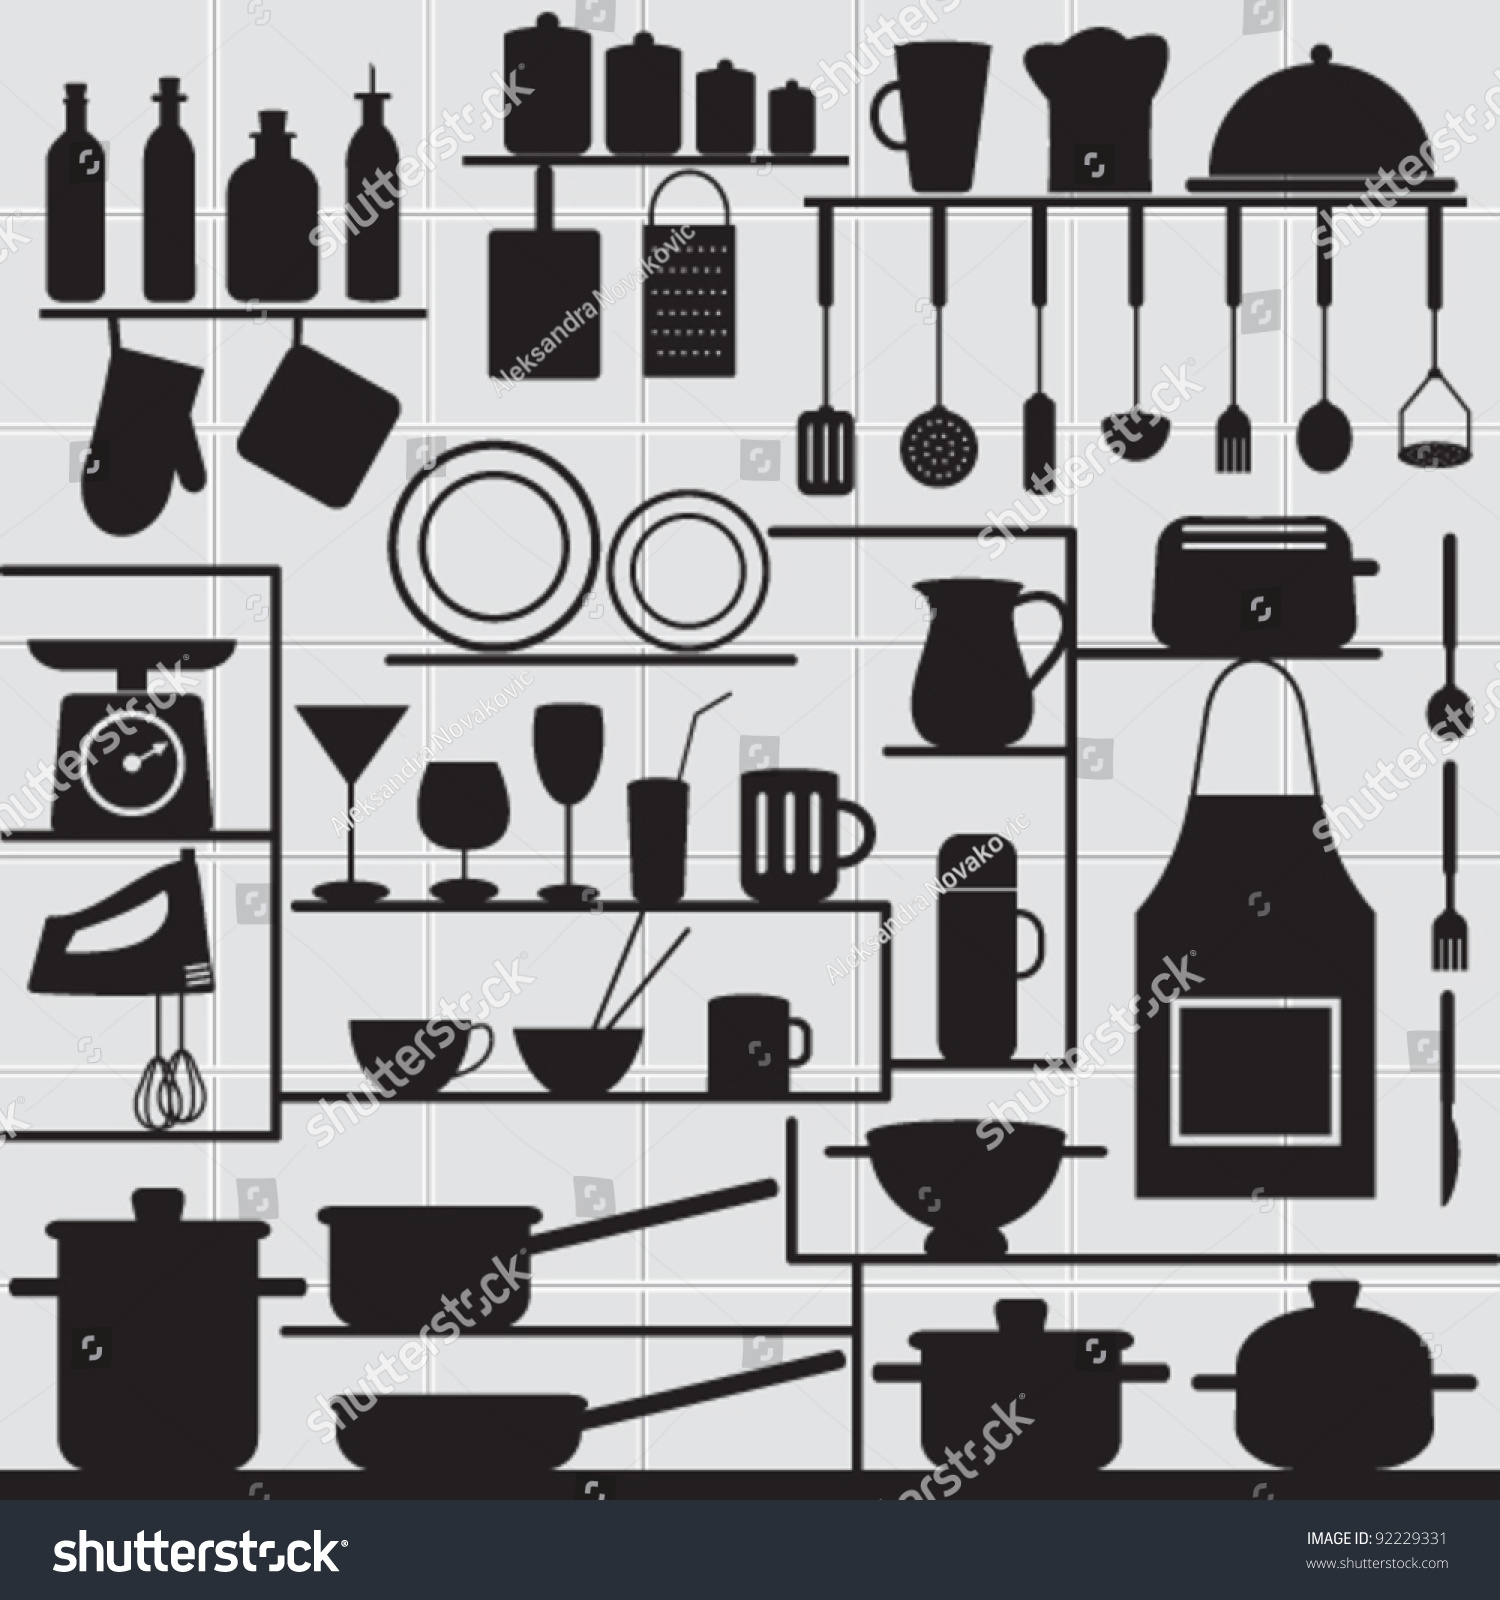 Restaurant Kitchen Background restaurant kitchen related symbols on tiled stock vector 92229331